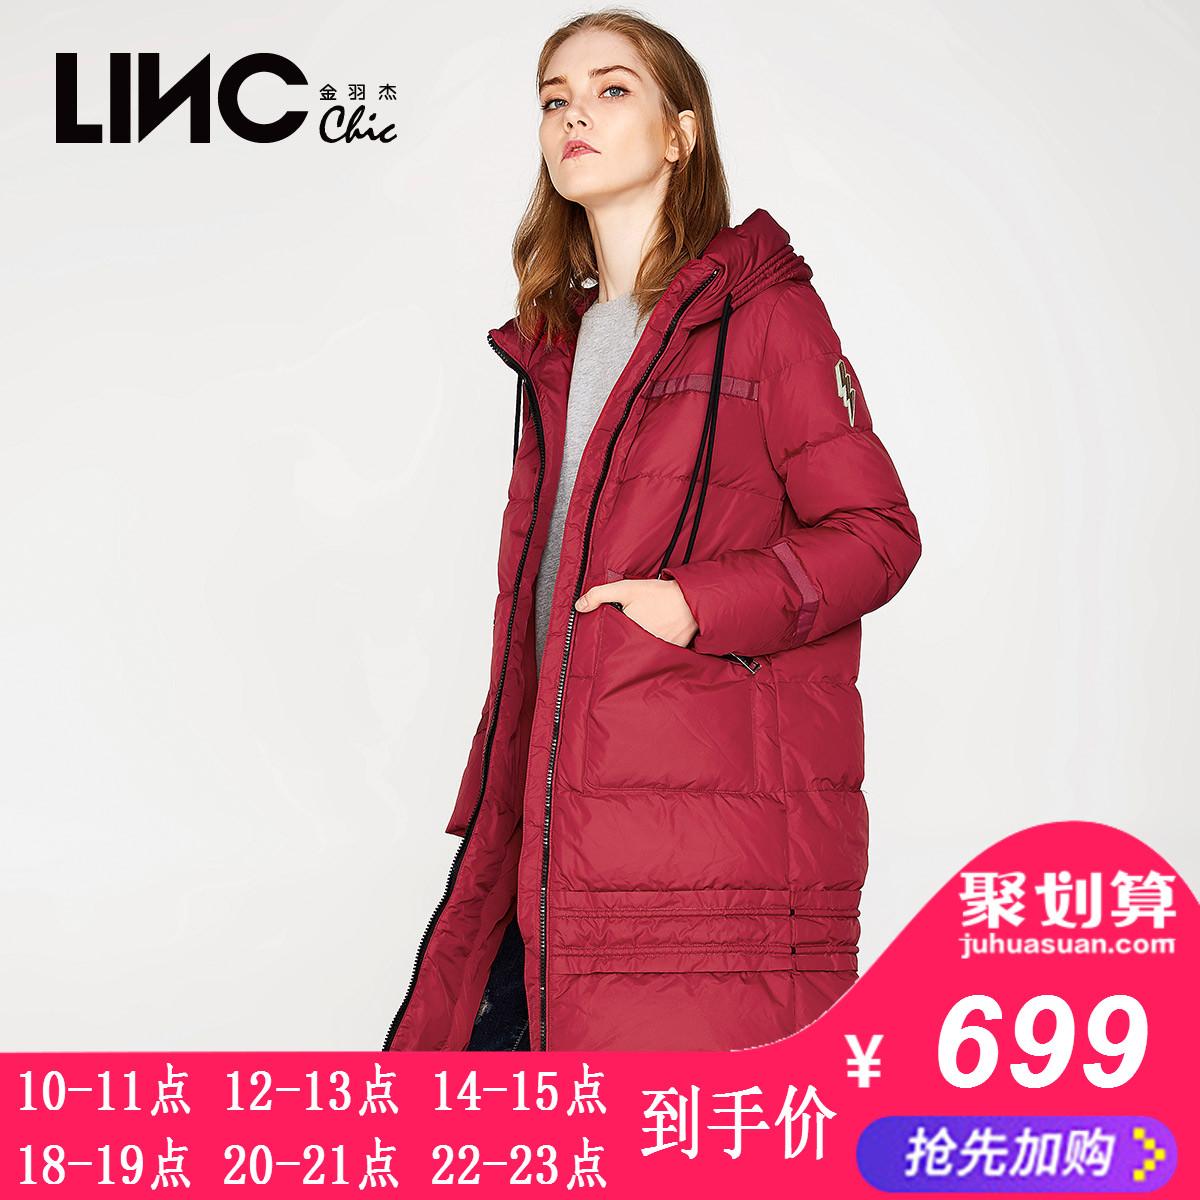 LINC金羽杰羽絨服中長款冬季新款女加厚時尚口袋黑色外套7471059